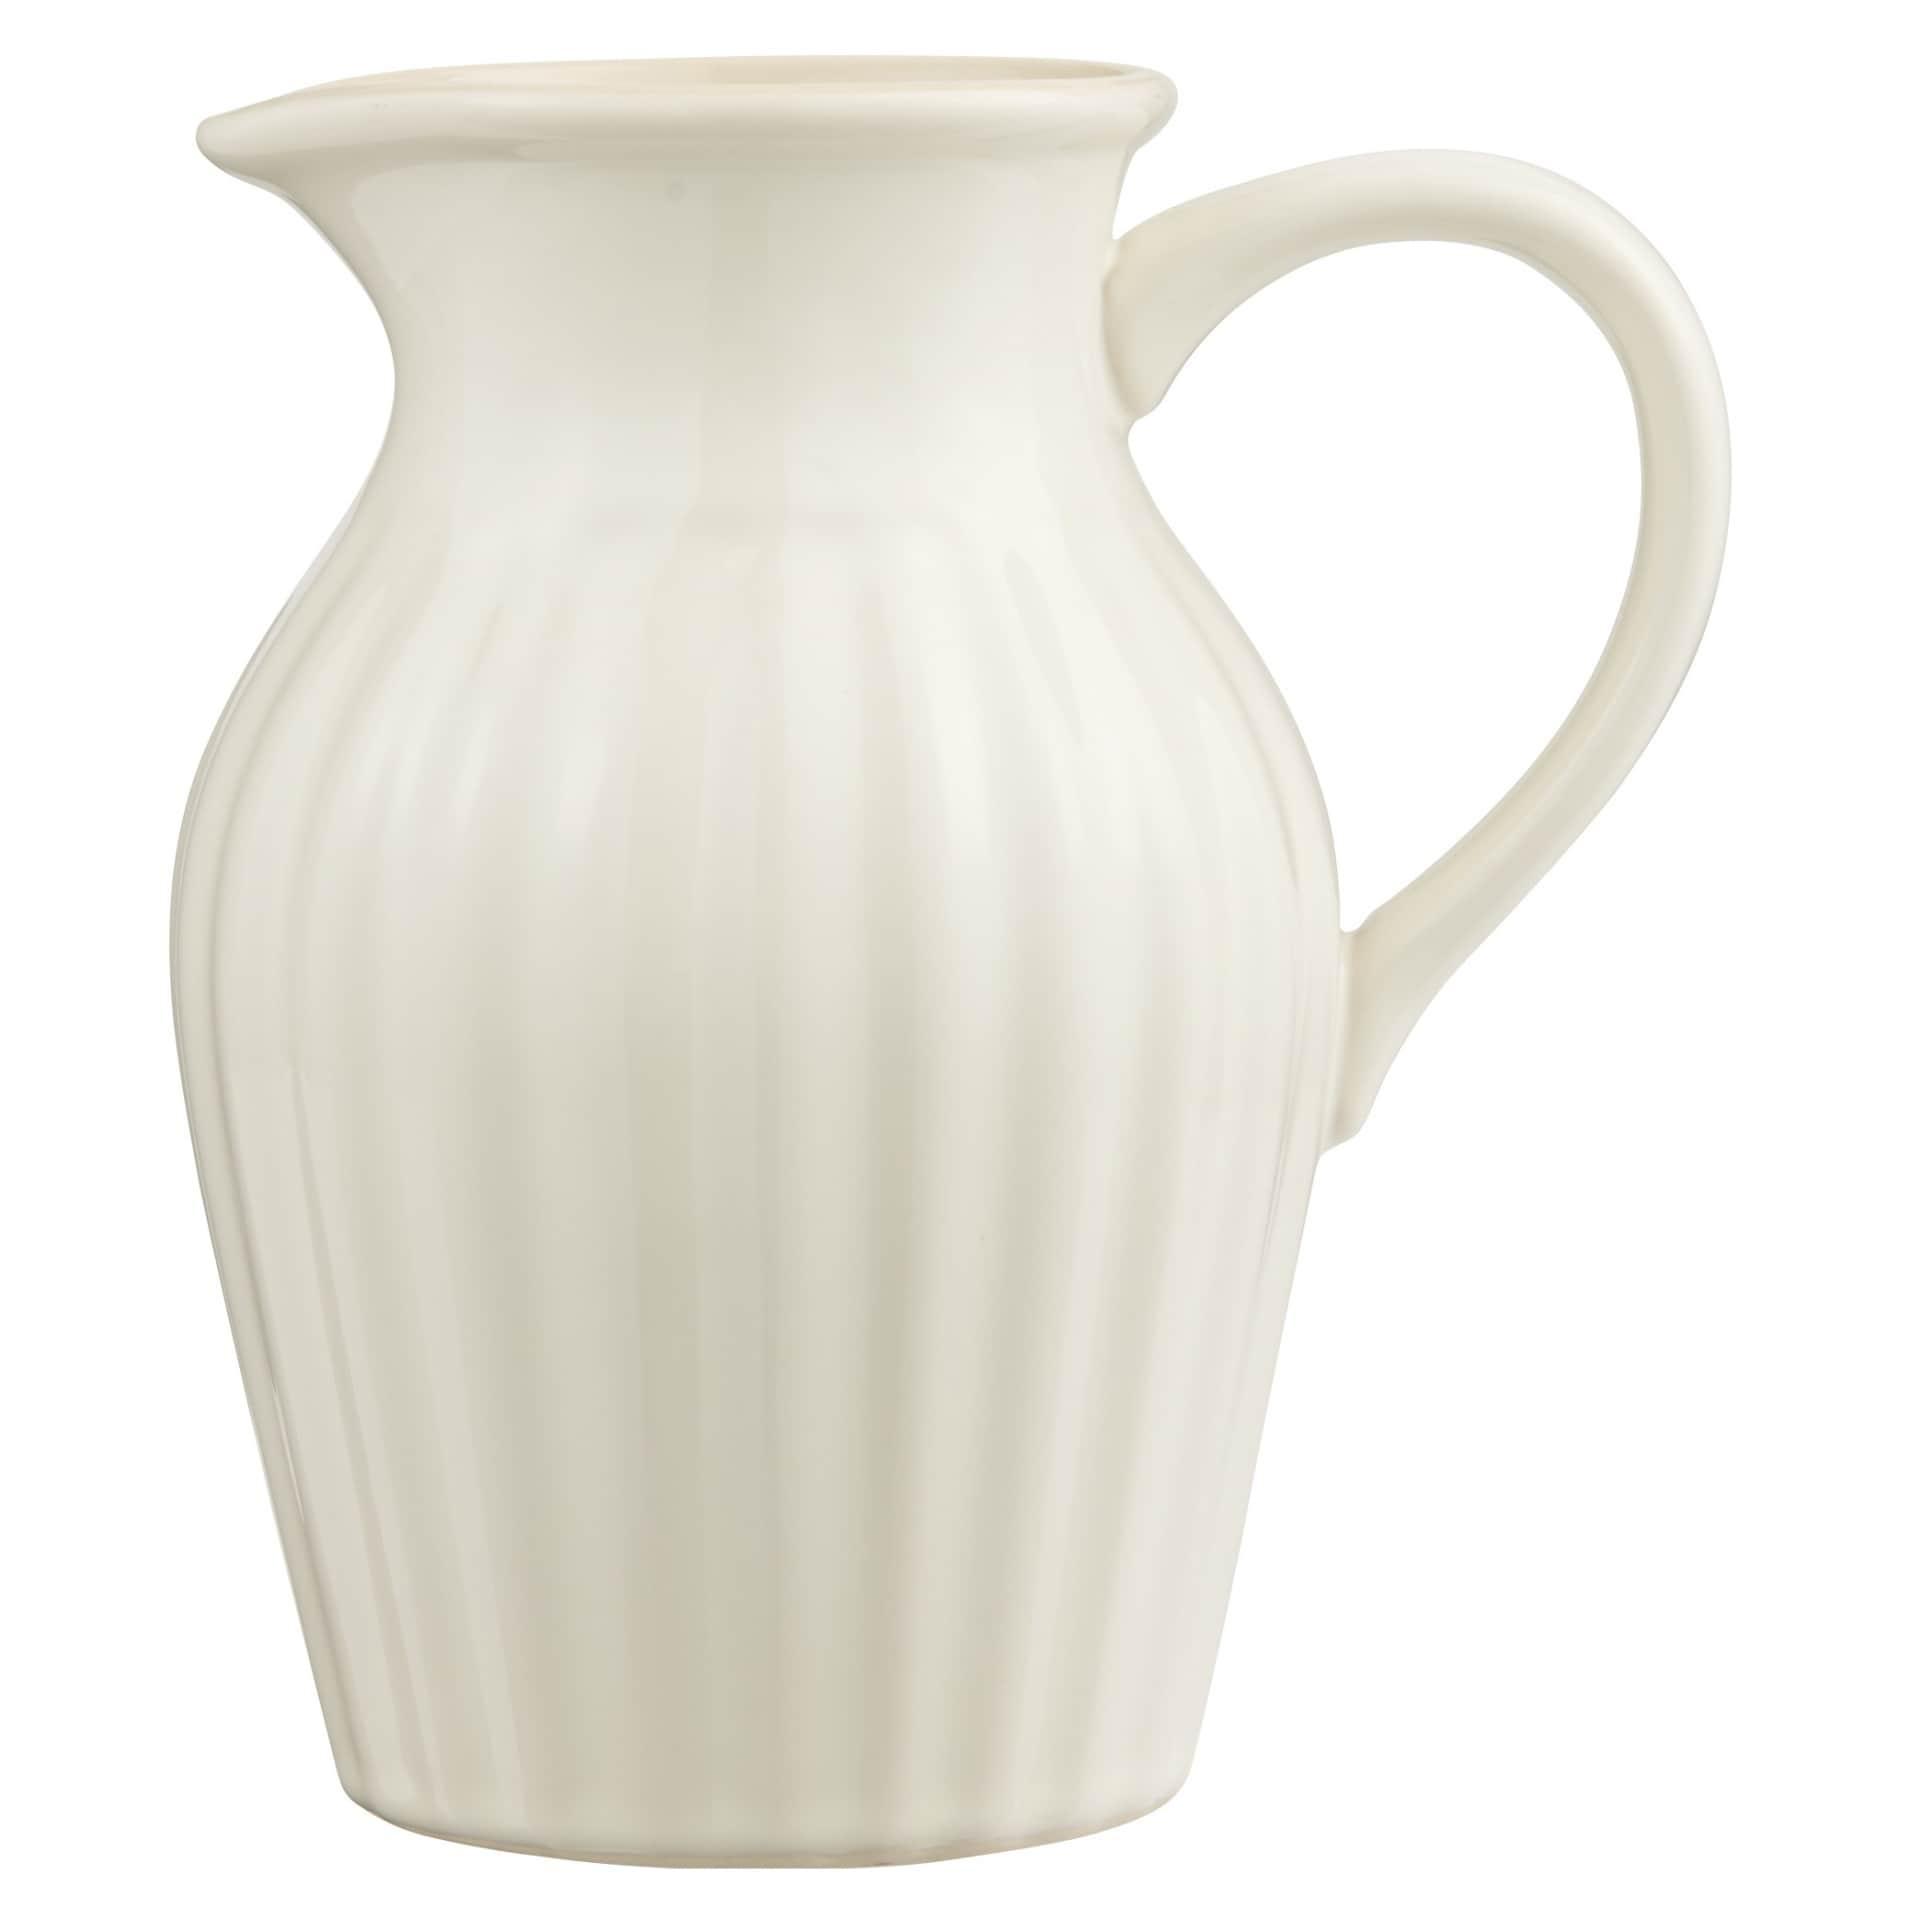 IB LAURSEN Džbán Mynte Butter Cream 1,7 l, krémová barva, keramika